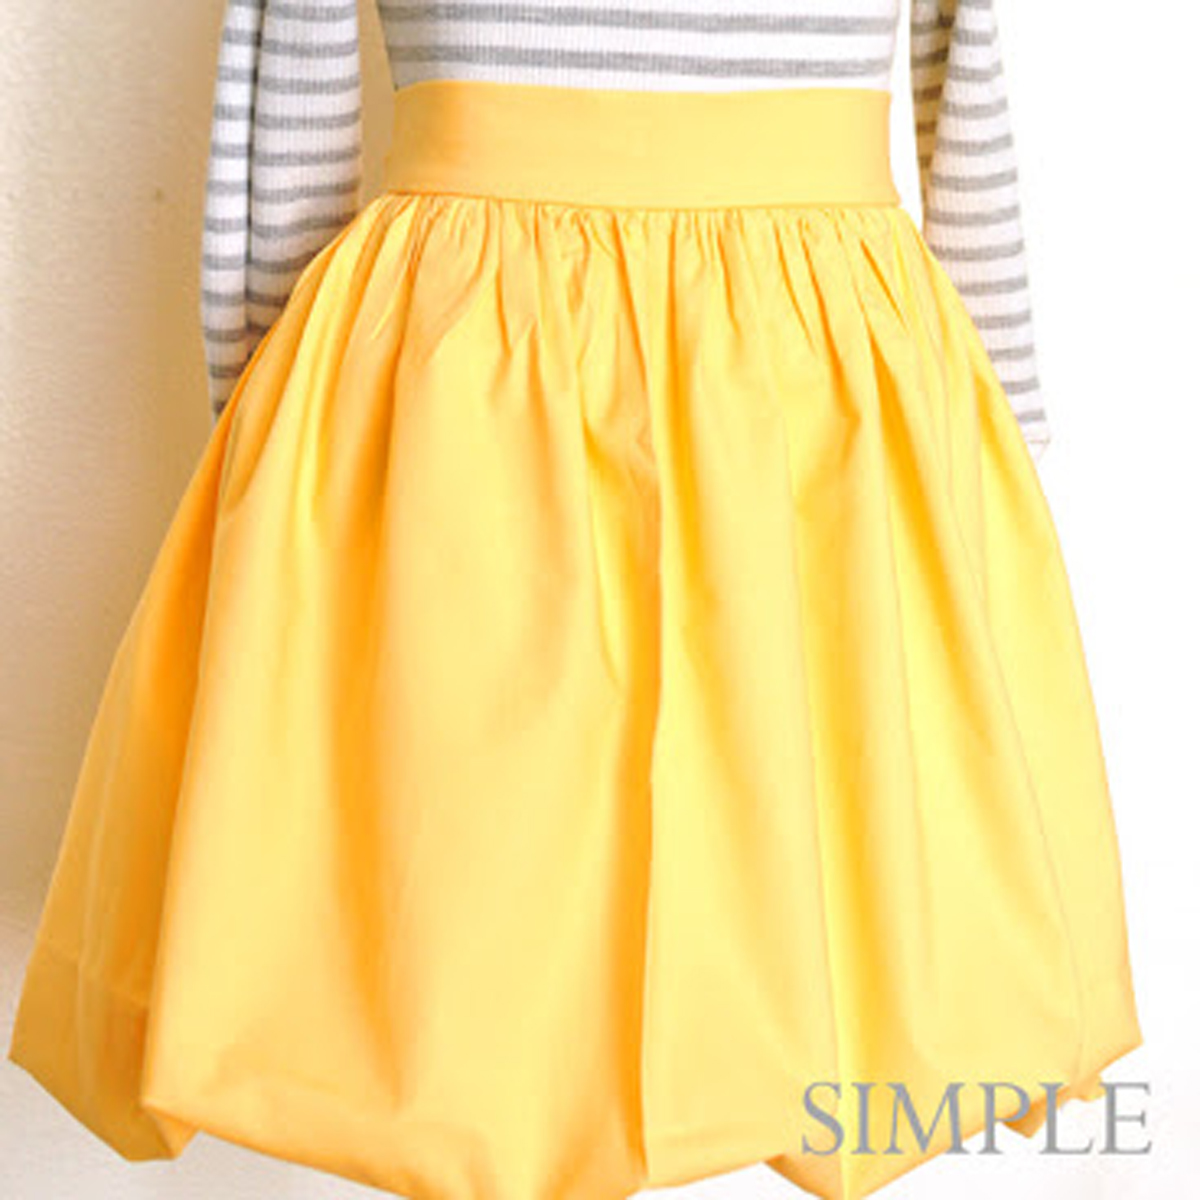 442b521d2b A Bubble Skirt Tutorial - Simple Simon and Company